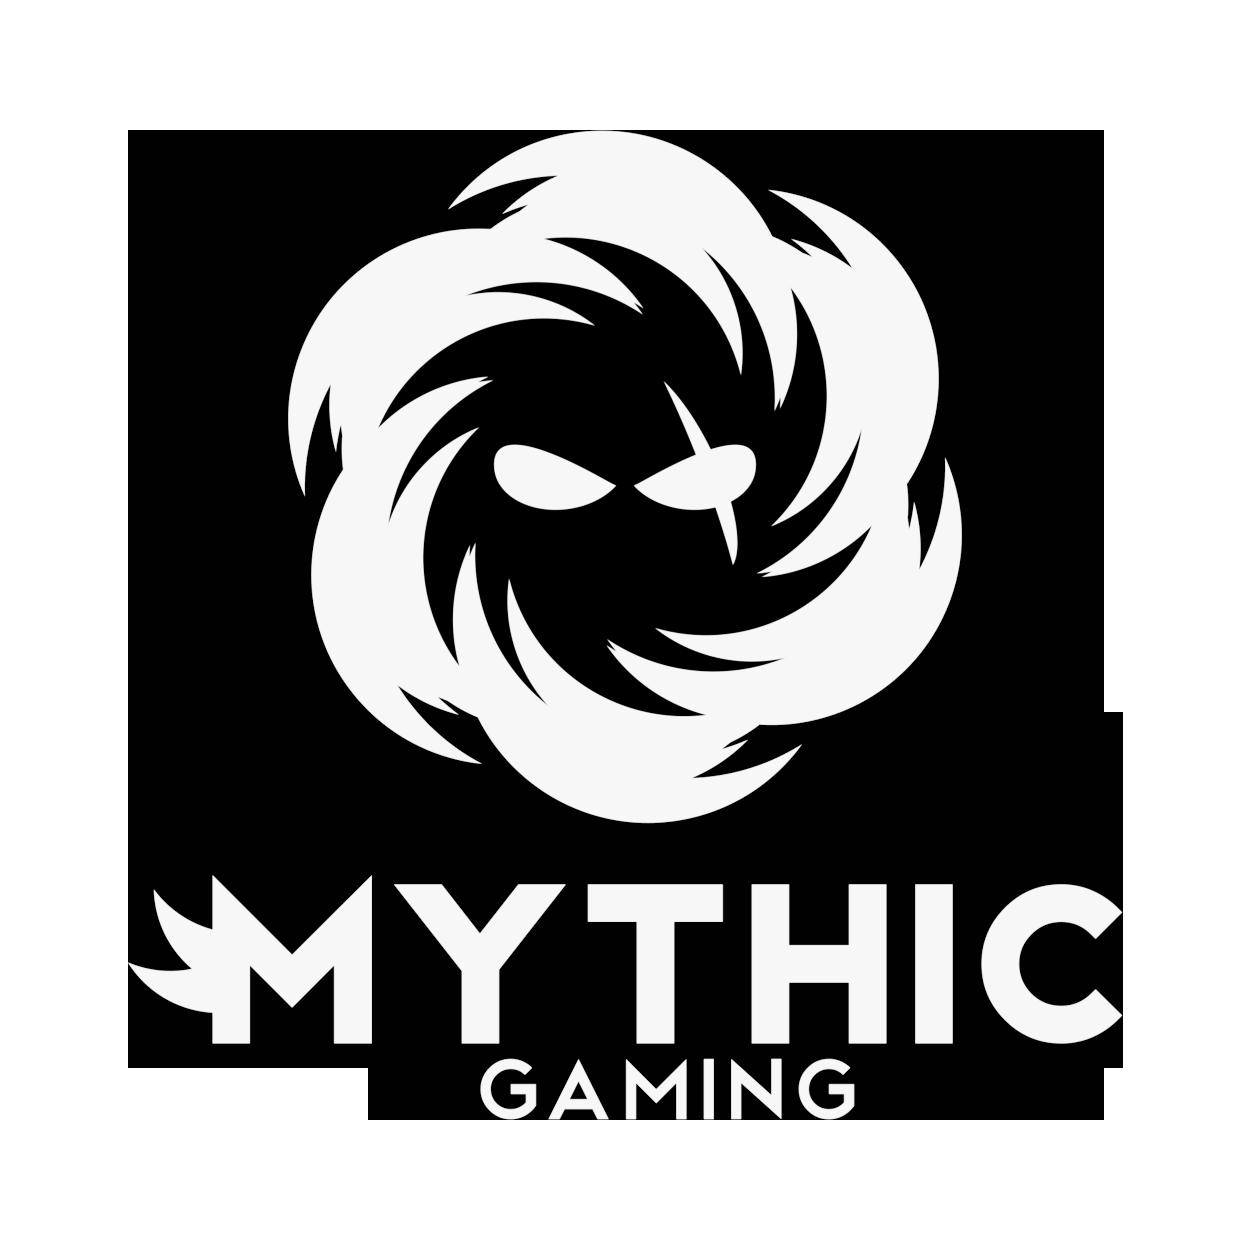 Mythic Gaming